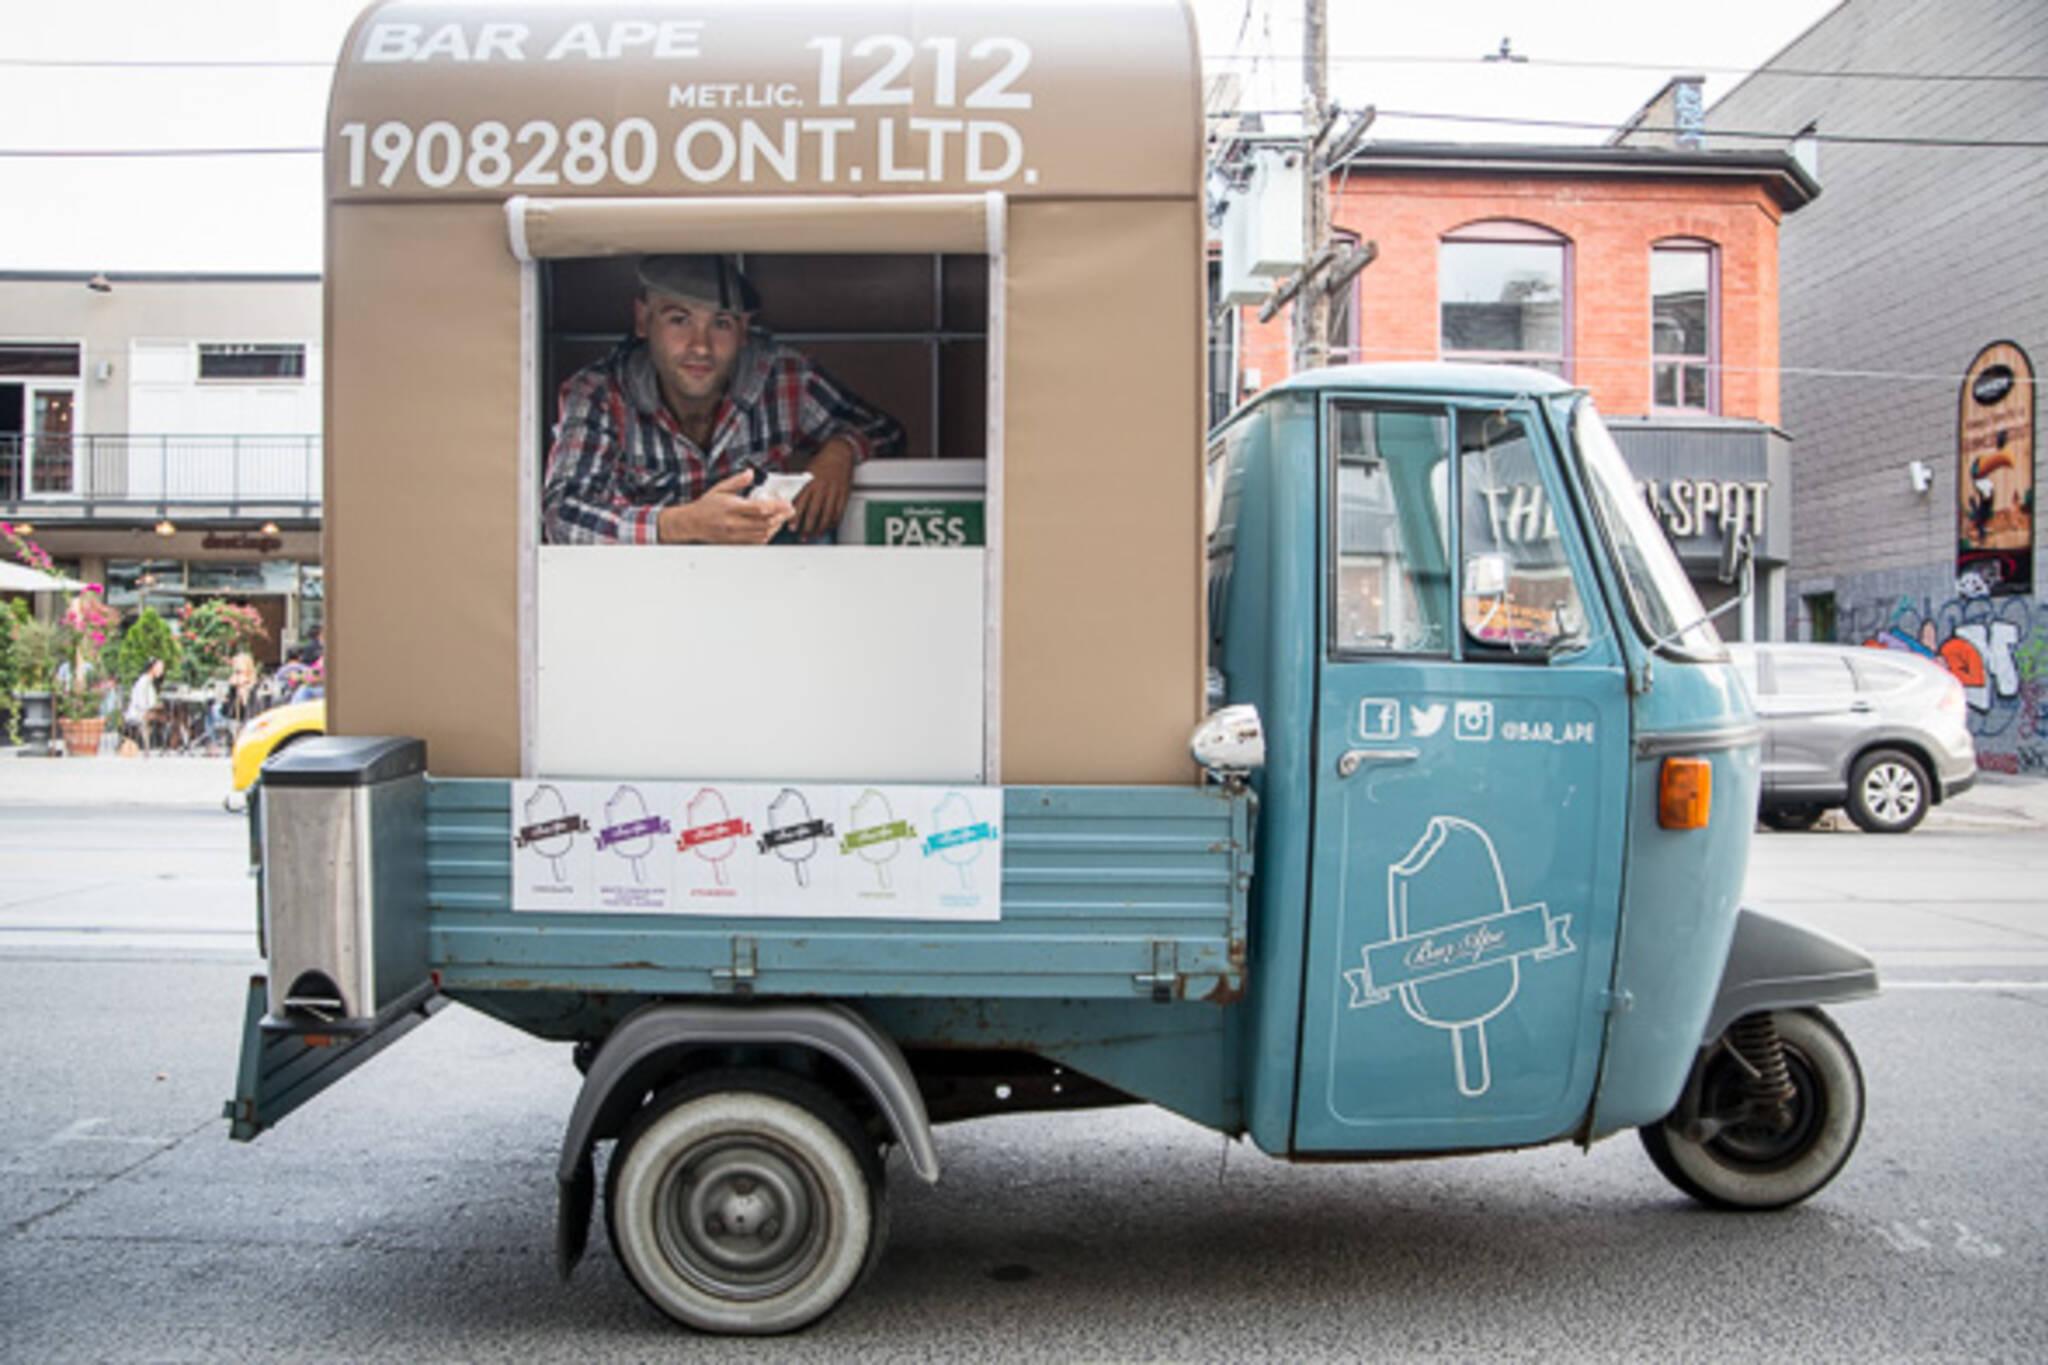 Carnavale Food Truck